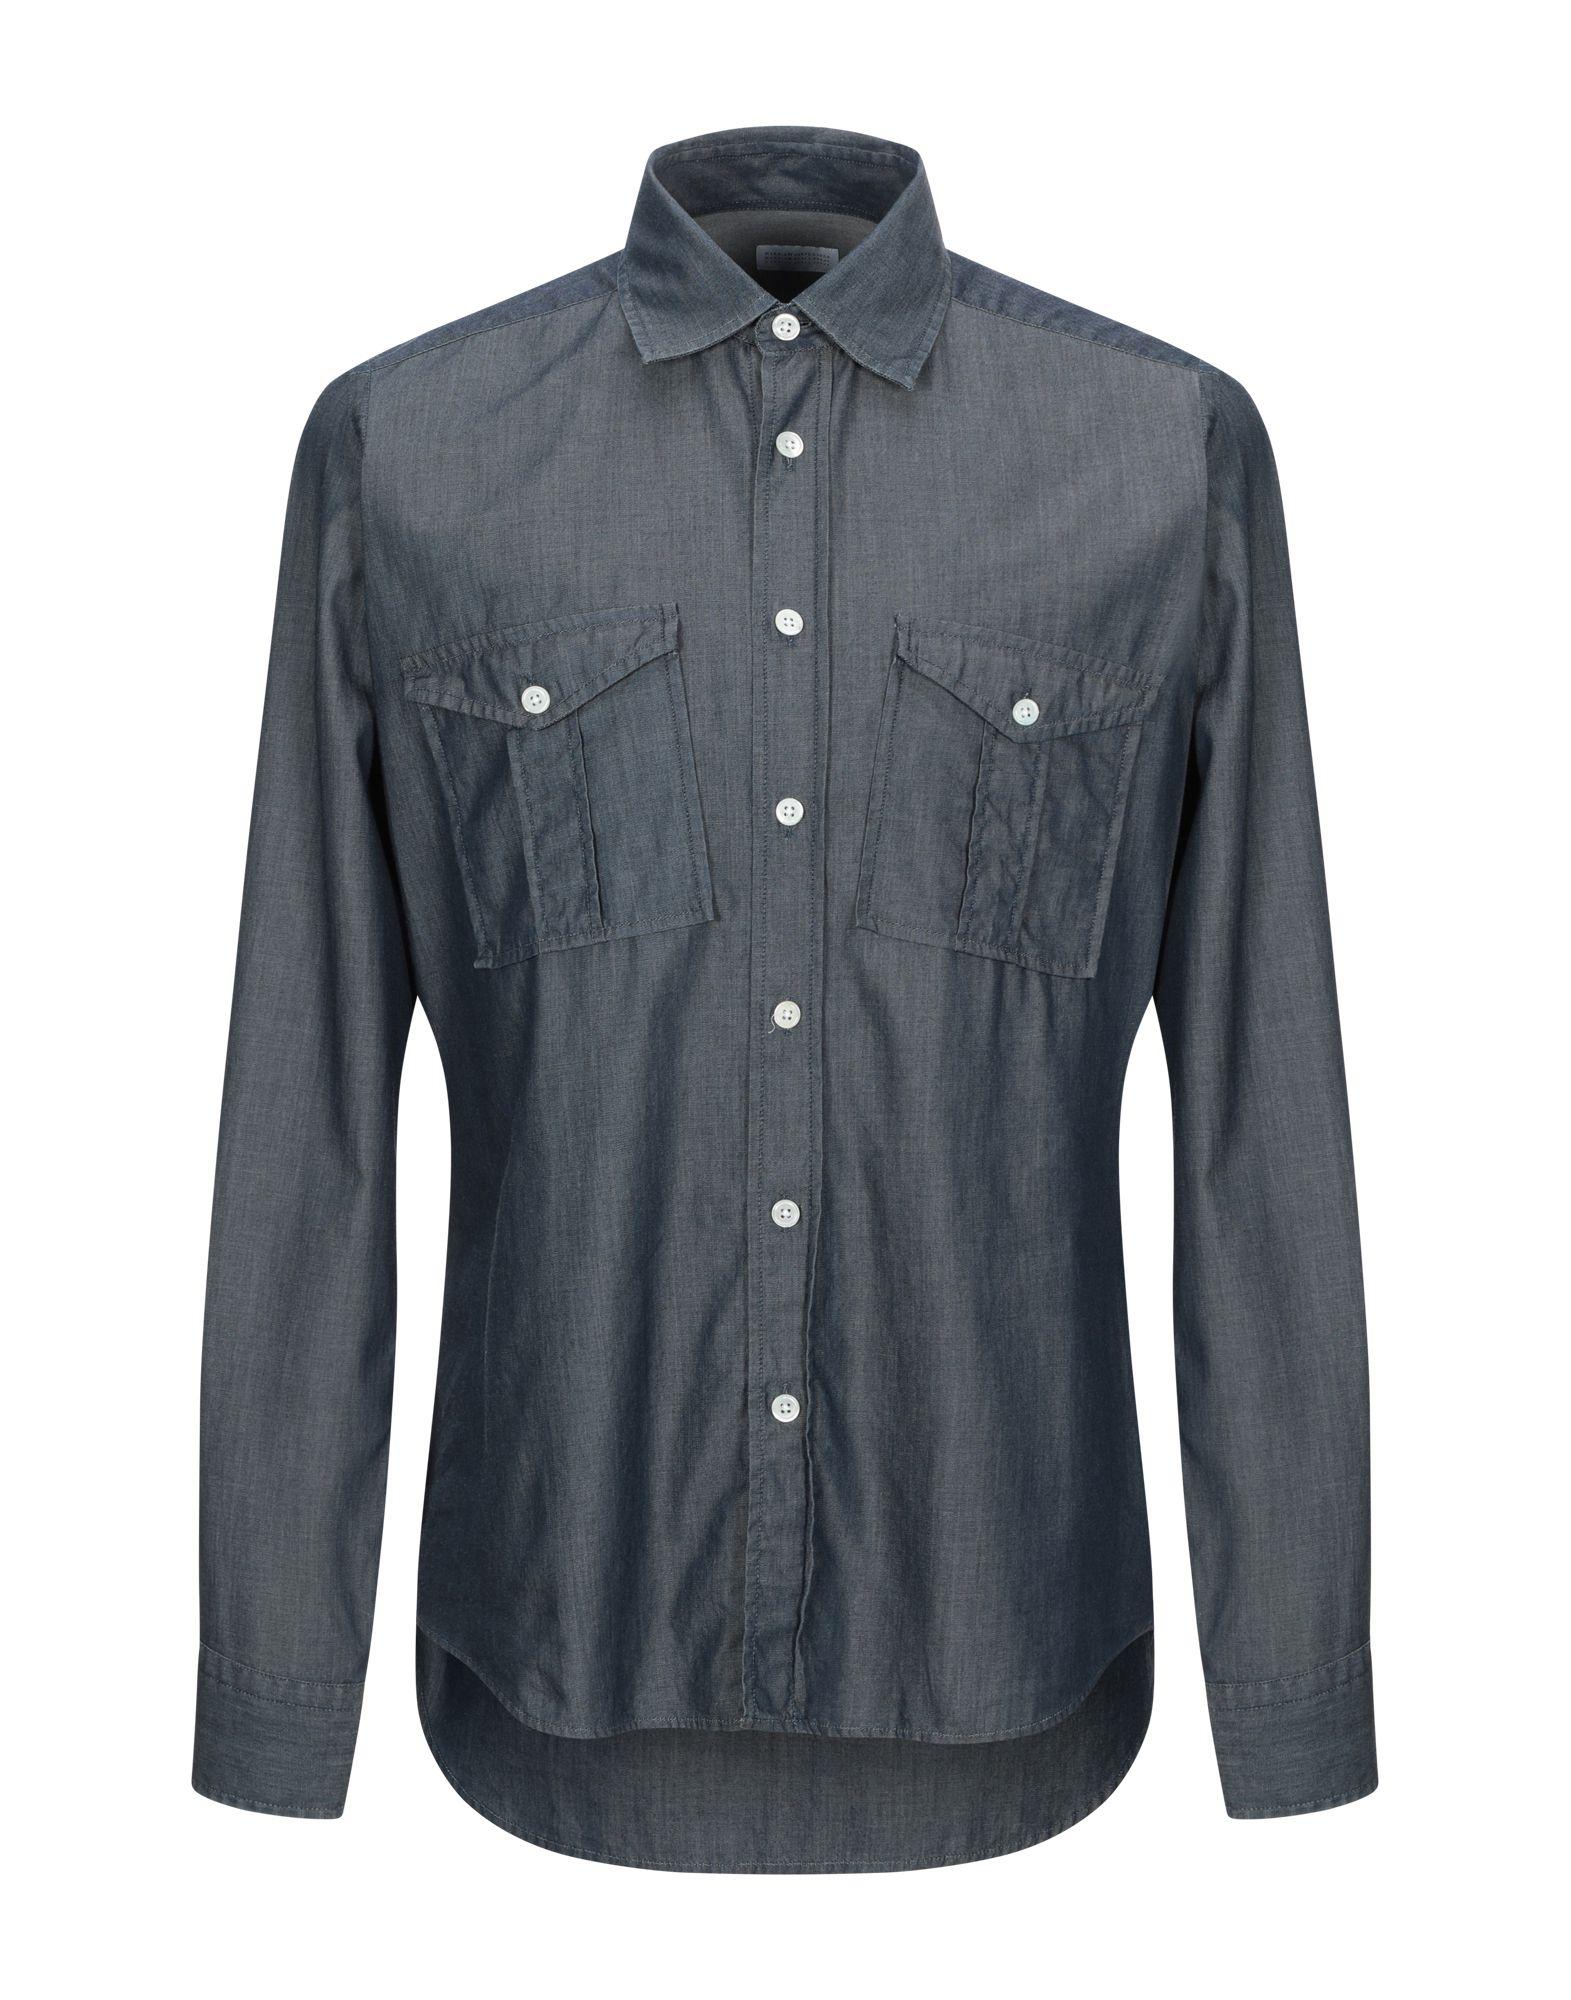 HARRIS WHARF LONDON Джинсовая рубашка